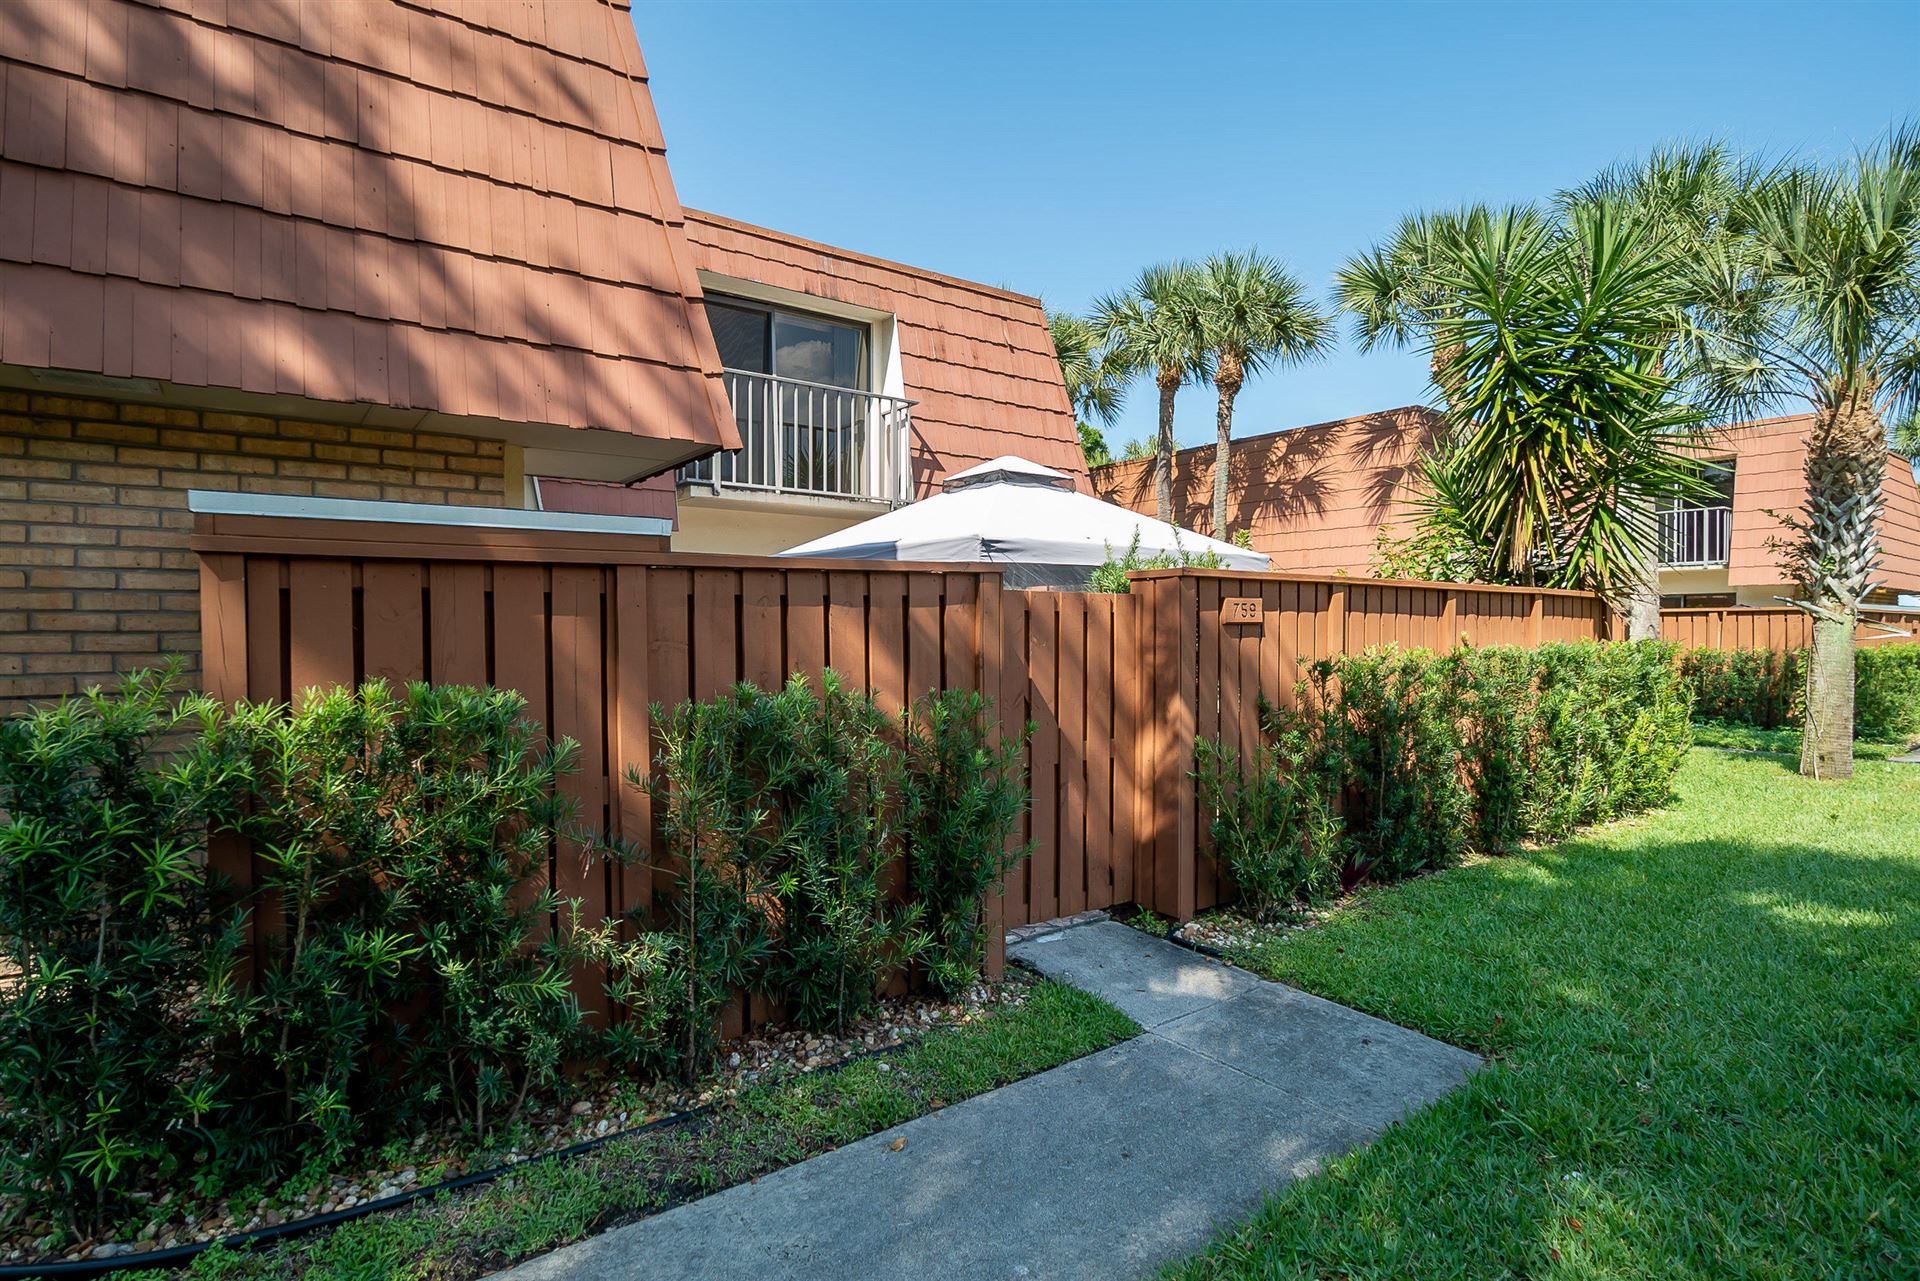 Photo of 759 Buttonwood Lane, Boynton Beach, FL 33436 (MLS # RX-10715363)